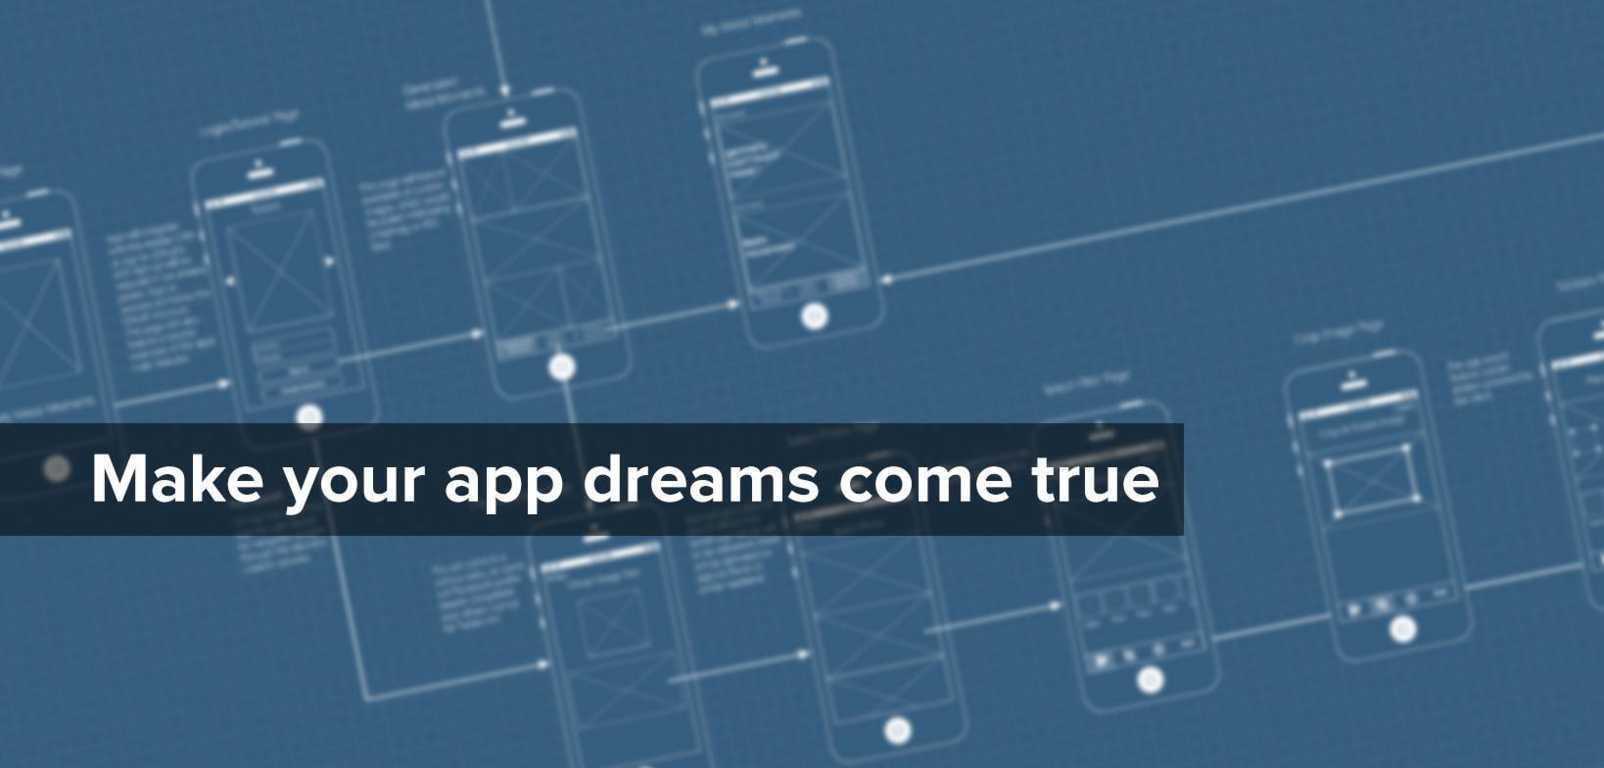 make your app